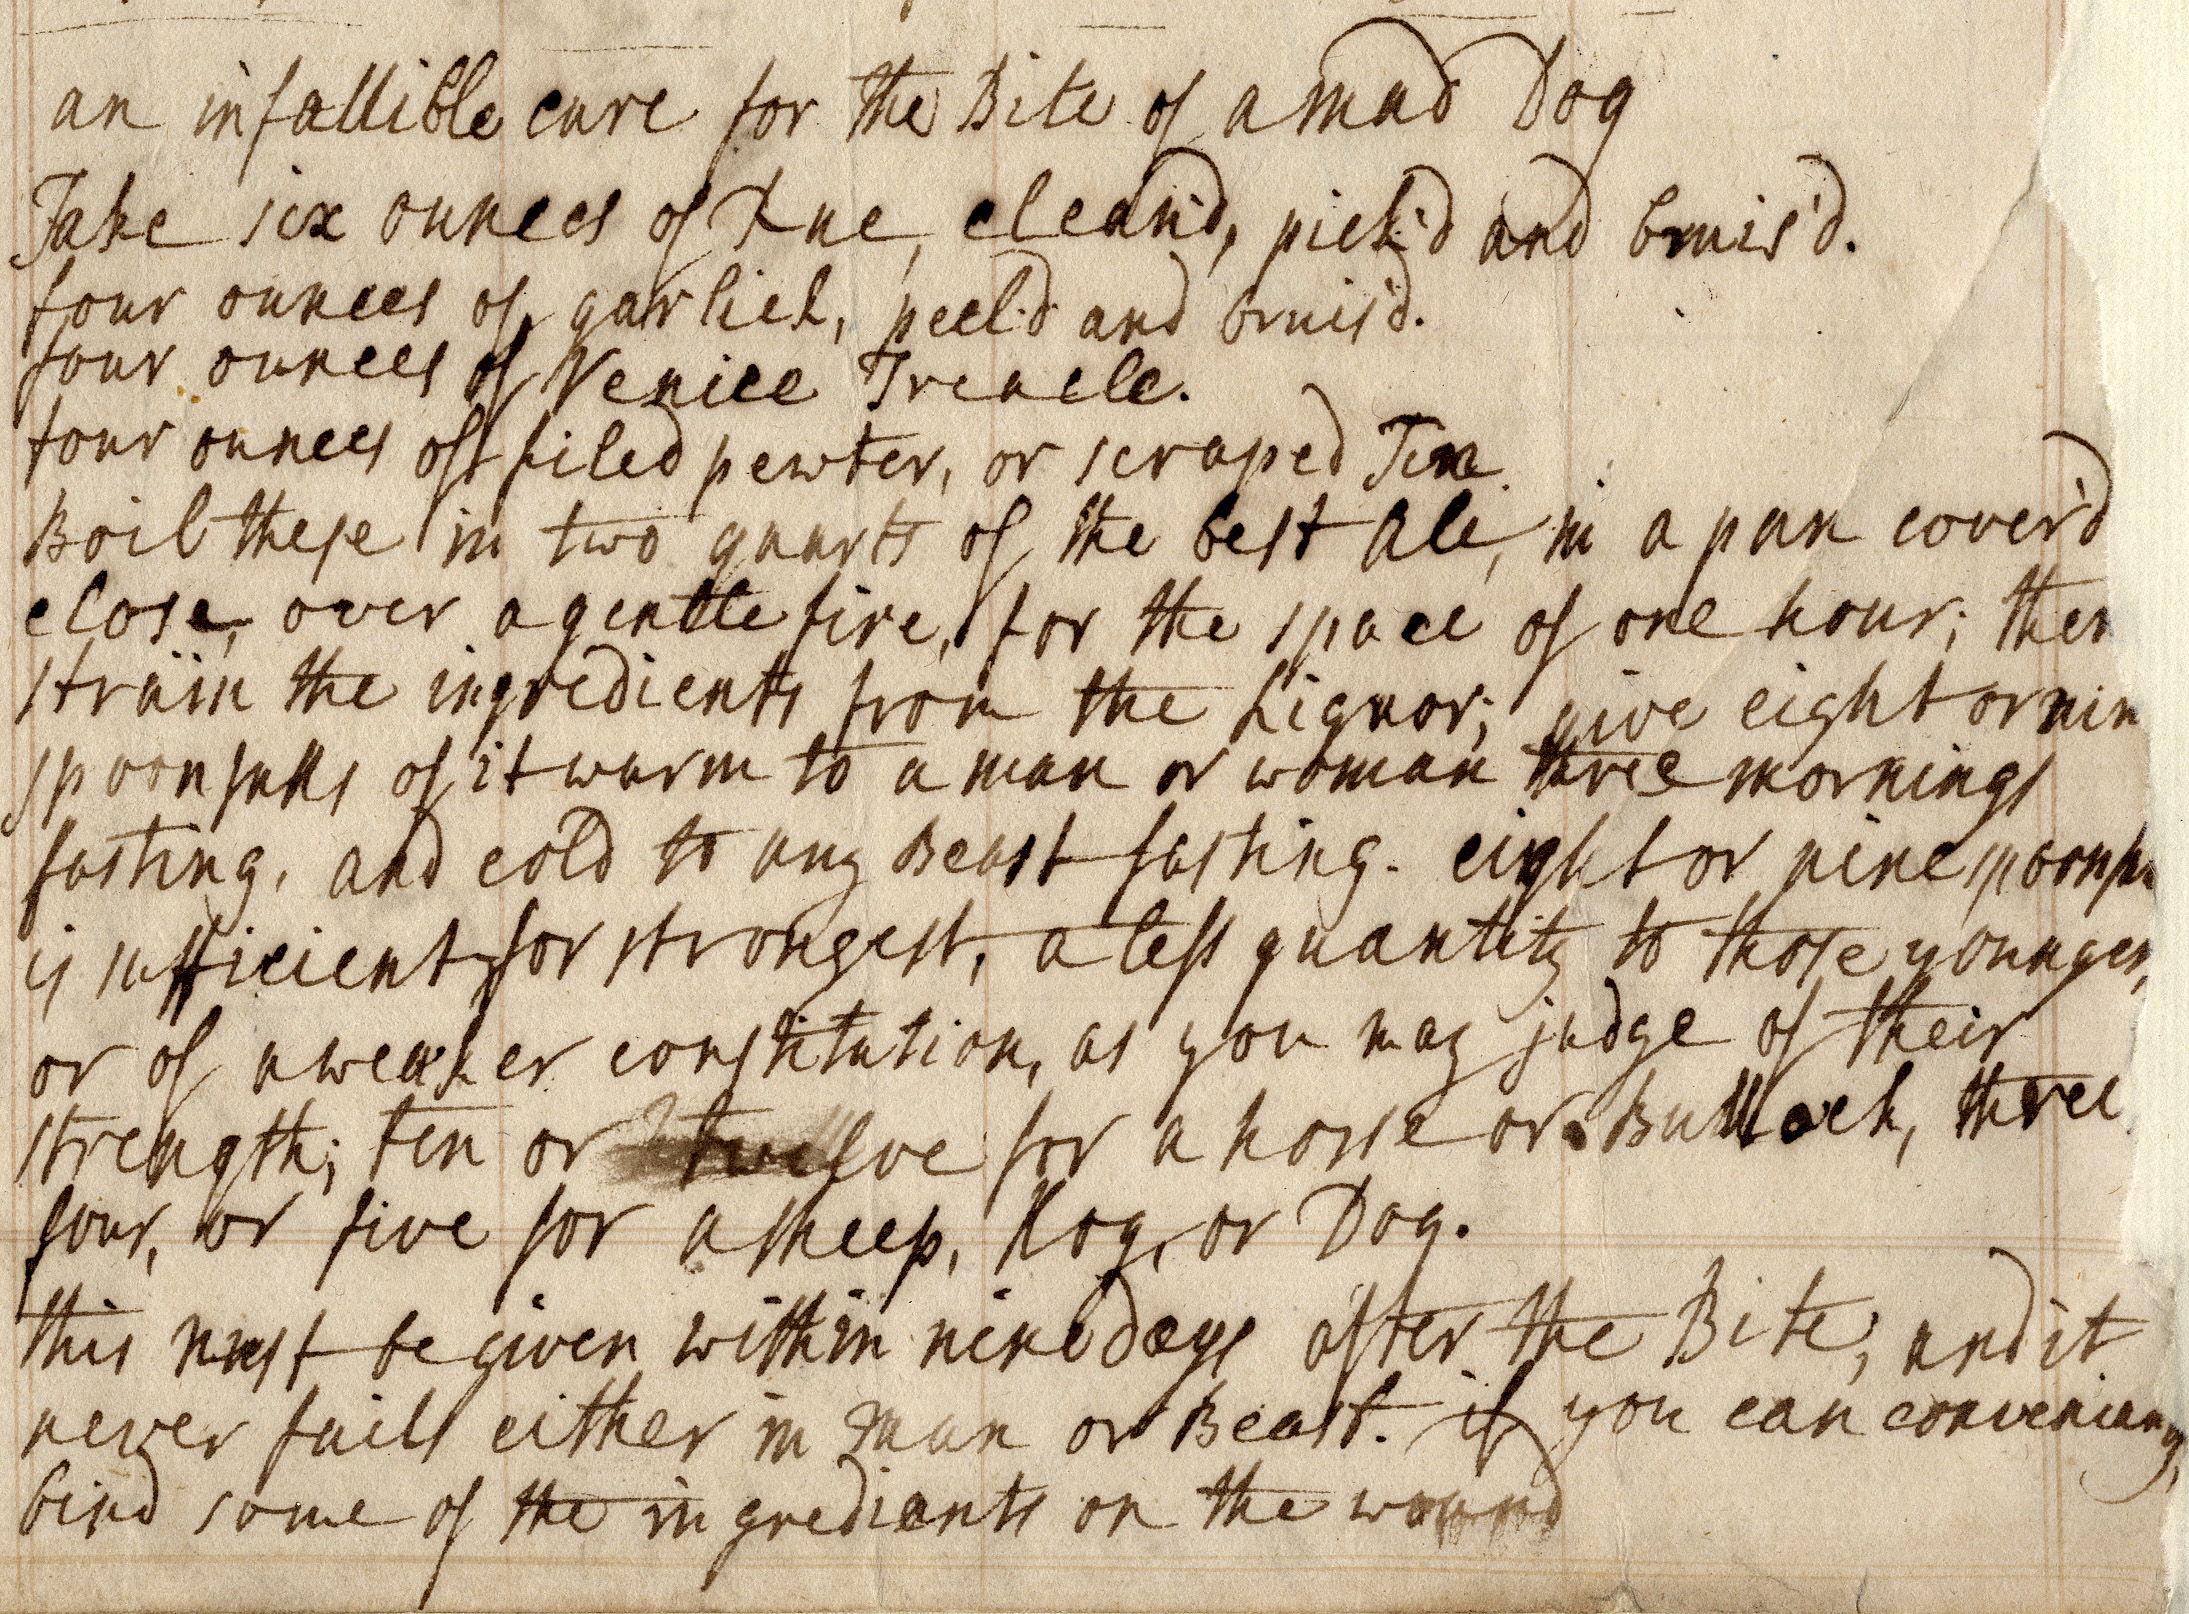 Scan of handwritten document.